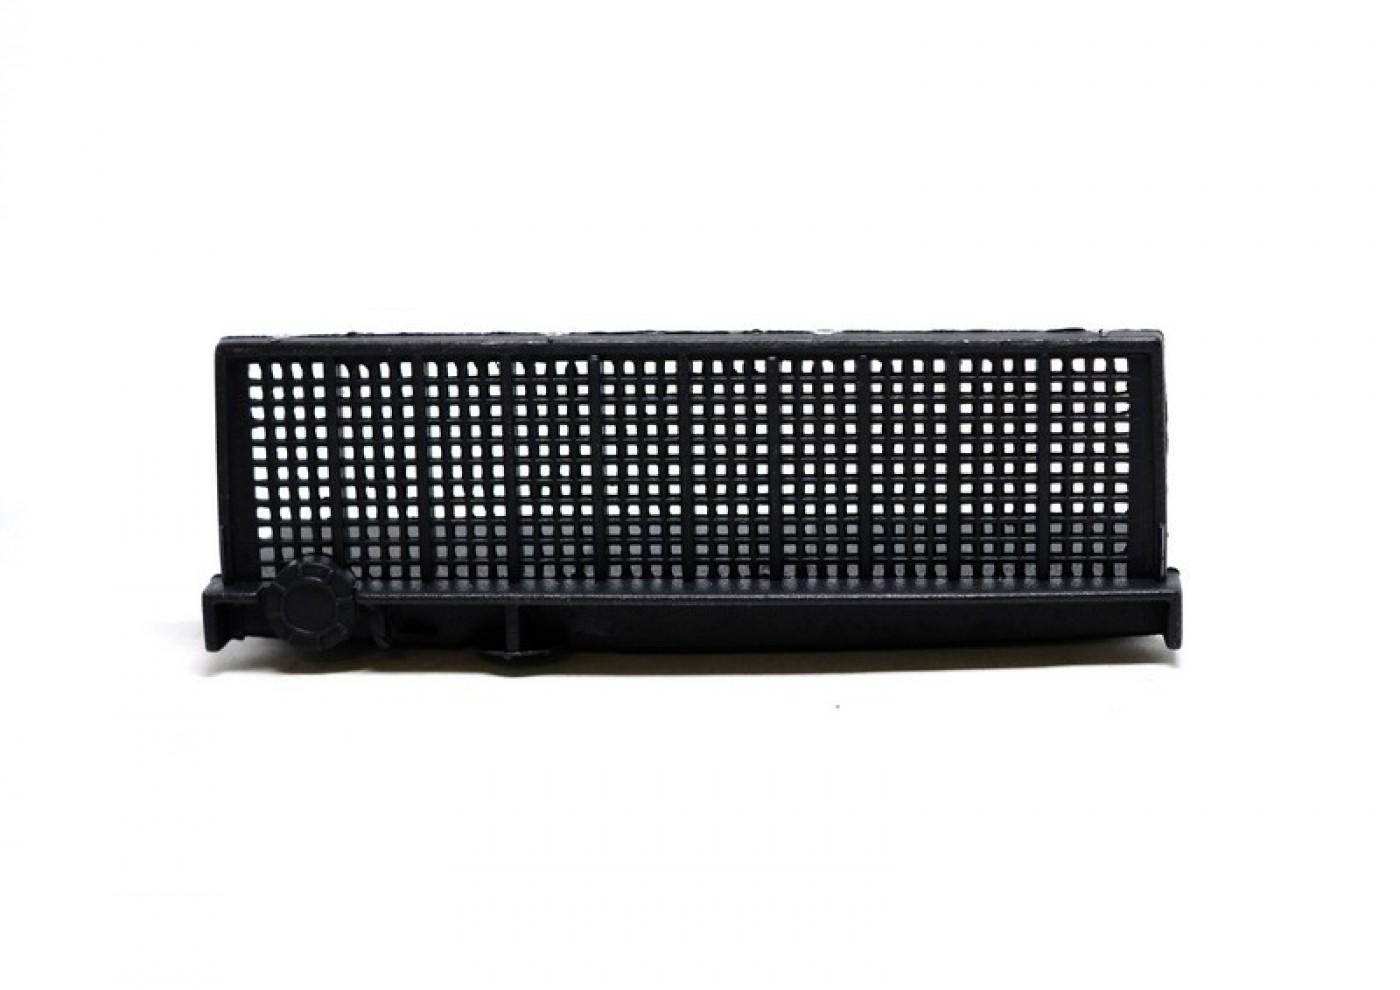 Kryt vzduchového filtra Stihl MS290 MS390 029 039